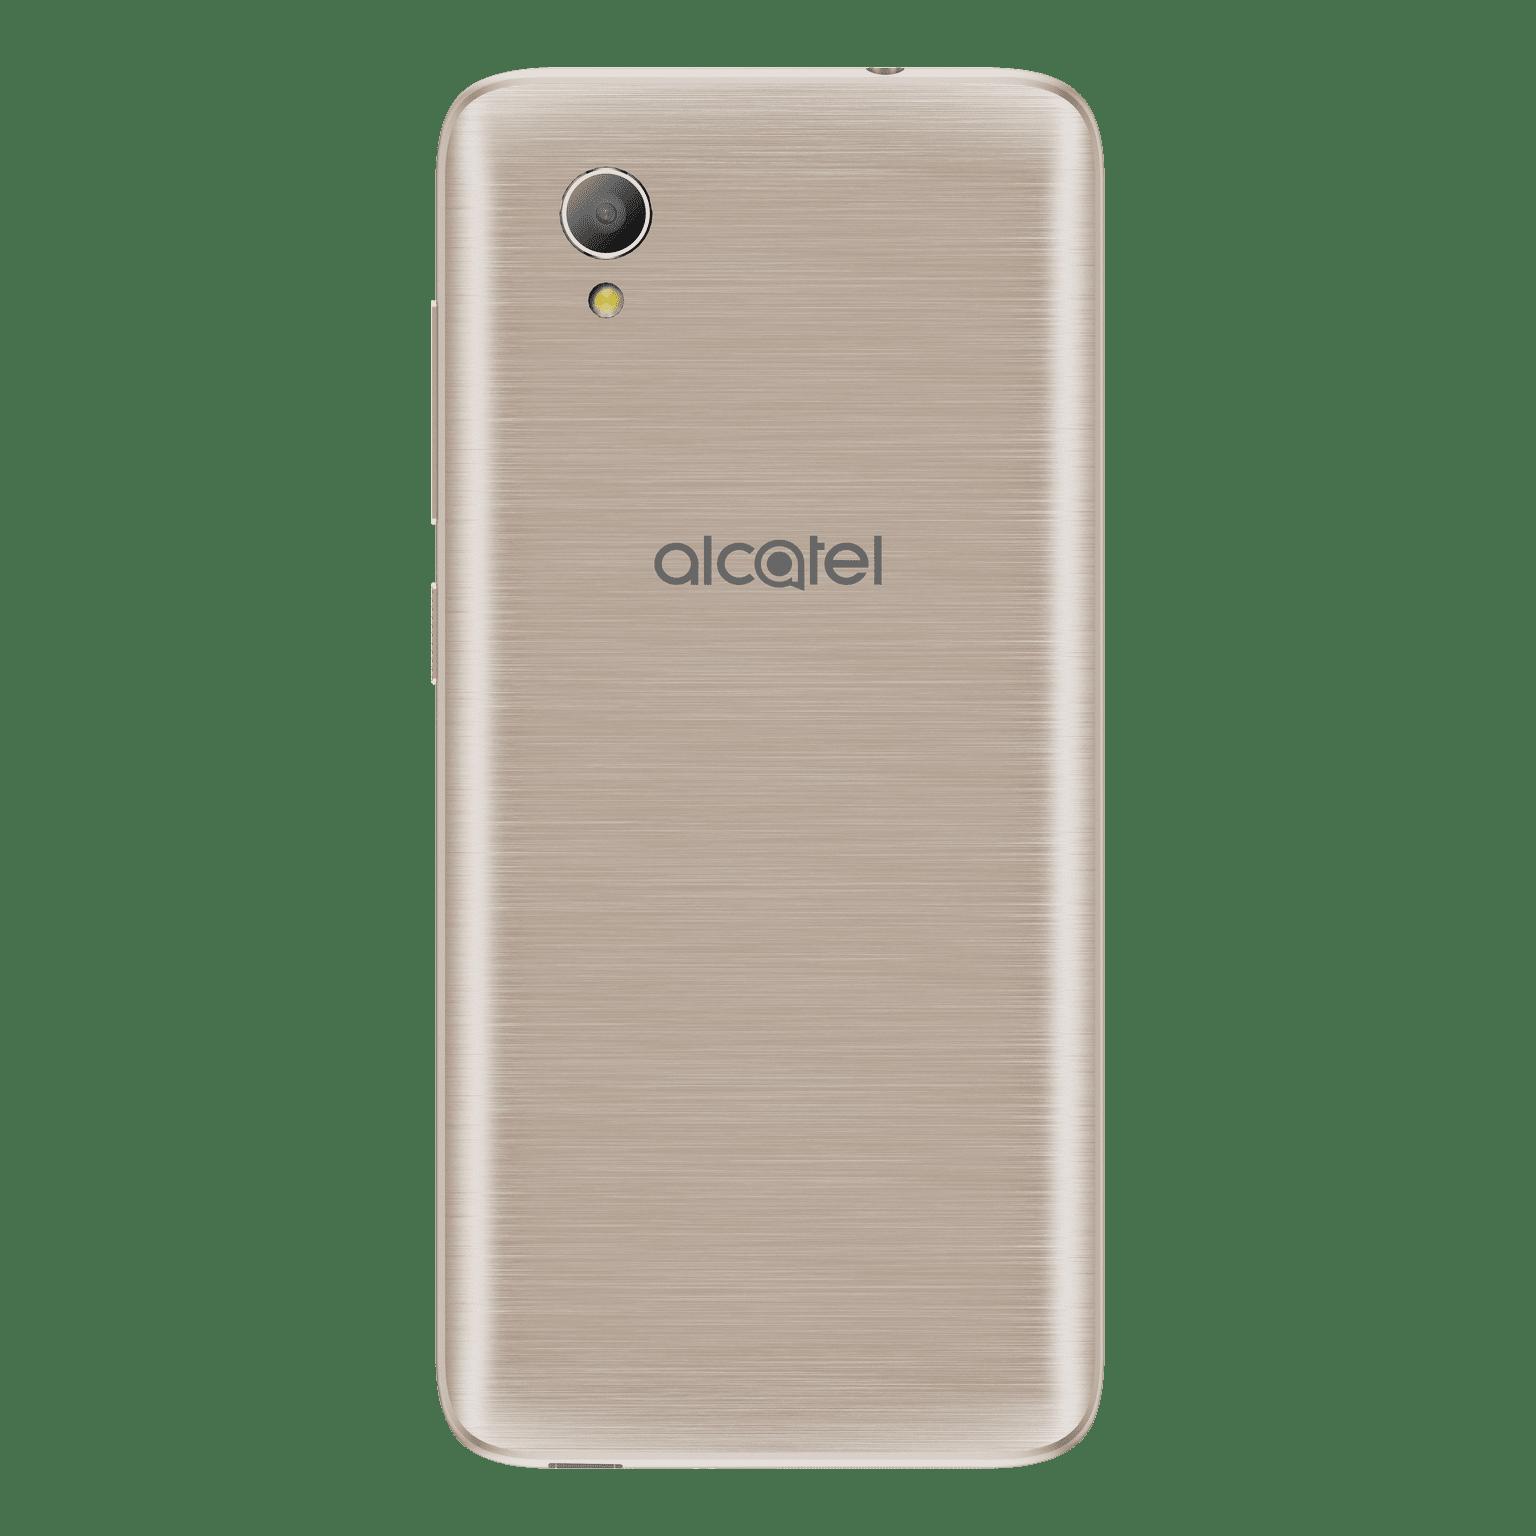 Alcatel выпустил смартфон Alcatel 1 на Android Go (JASciEMw)